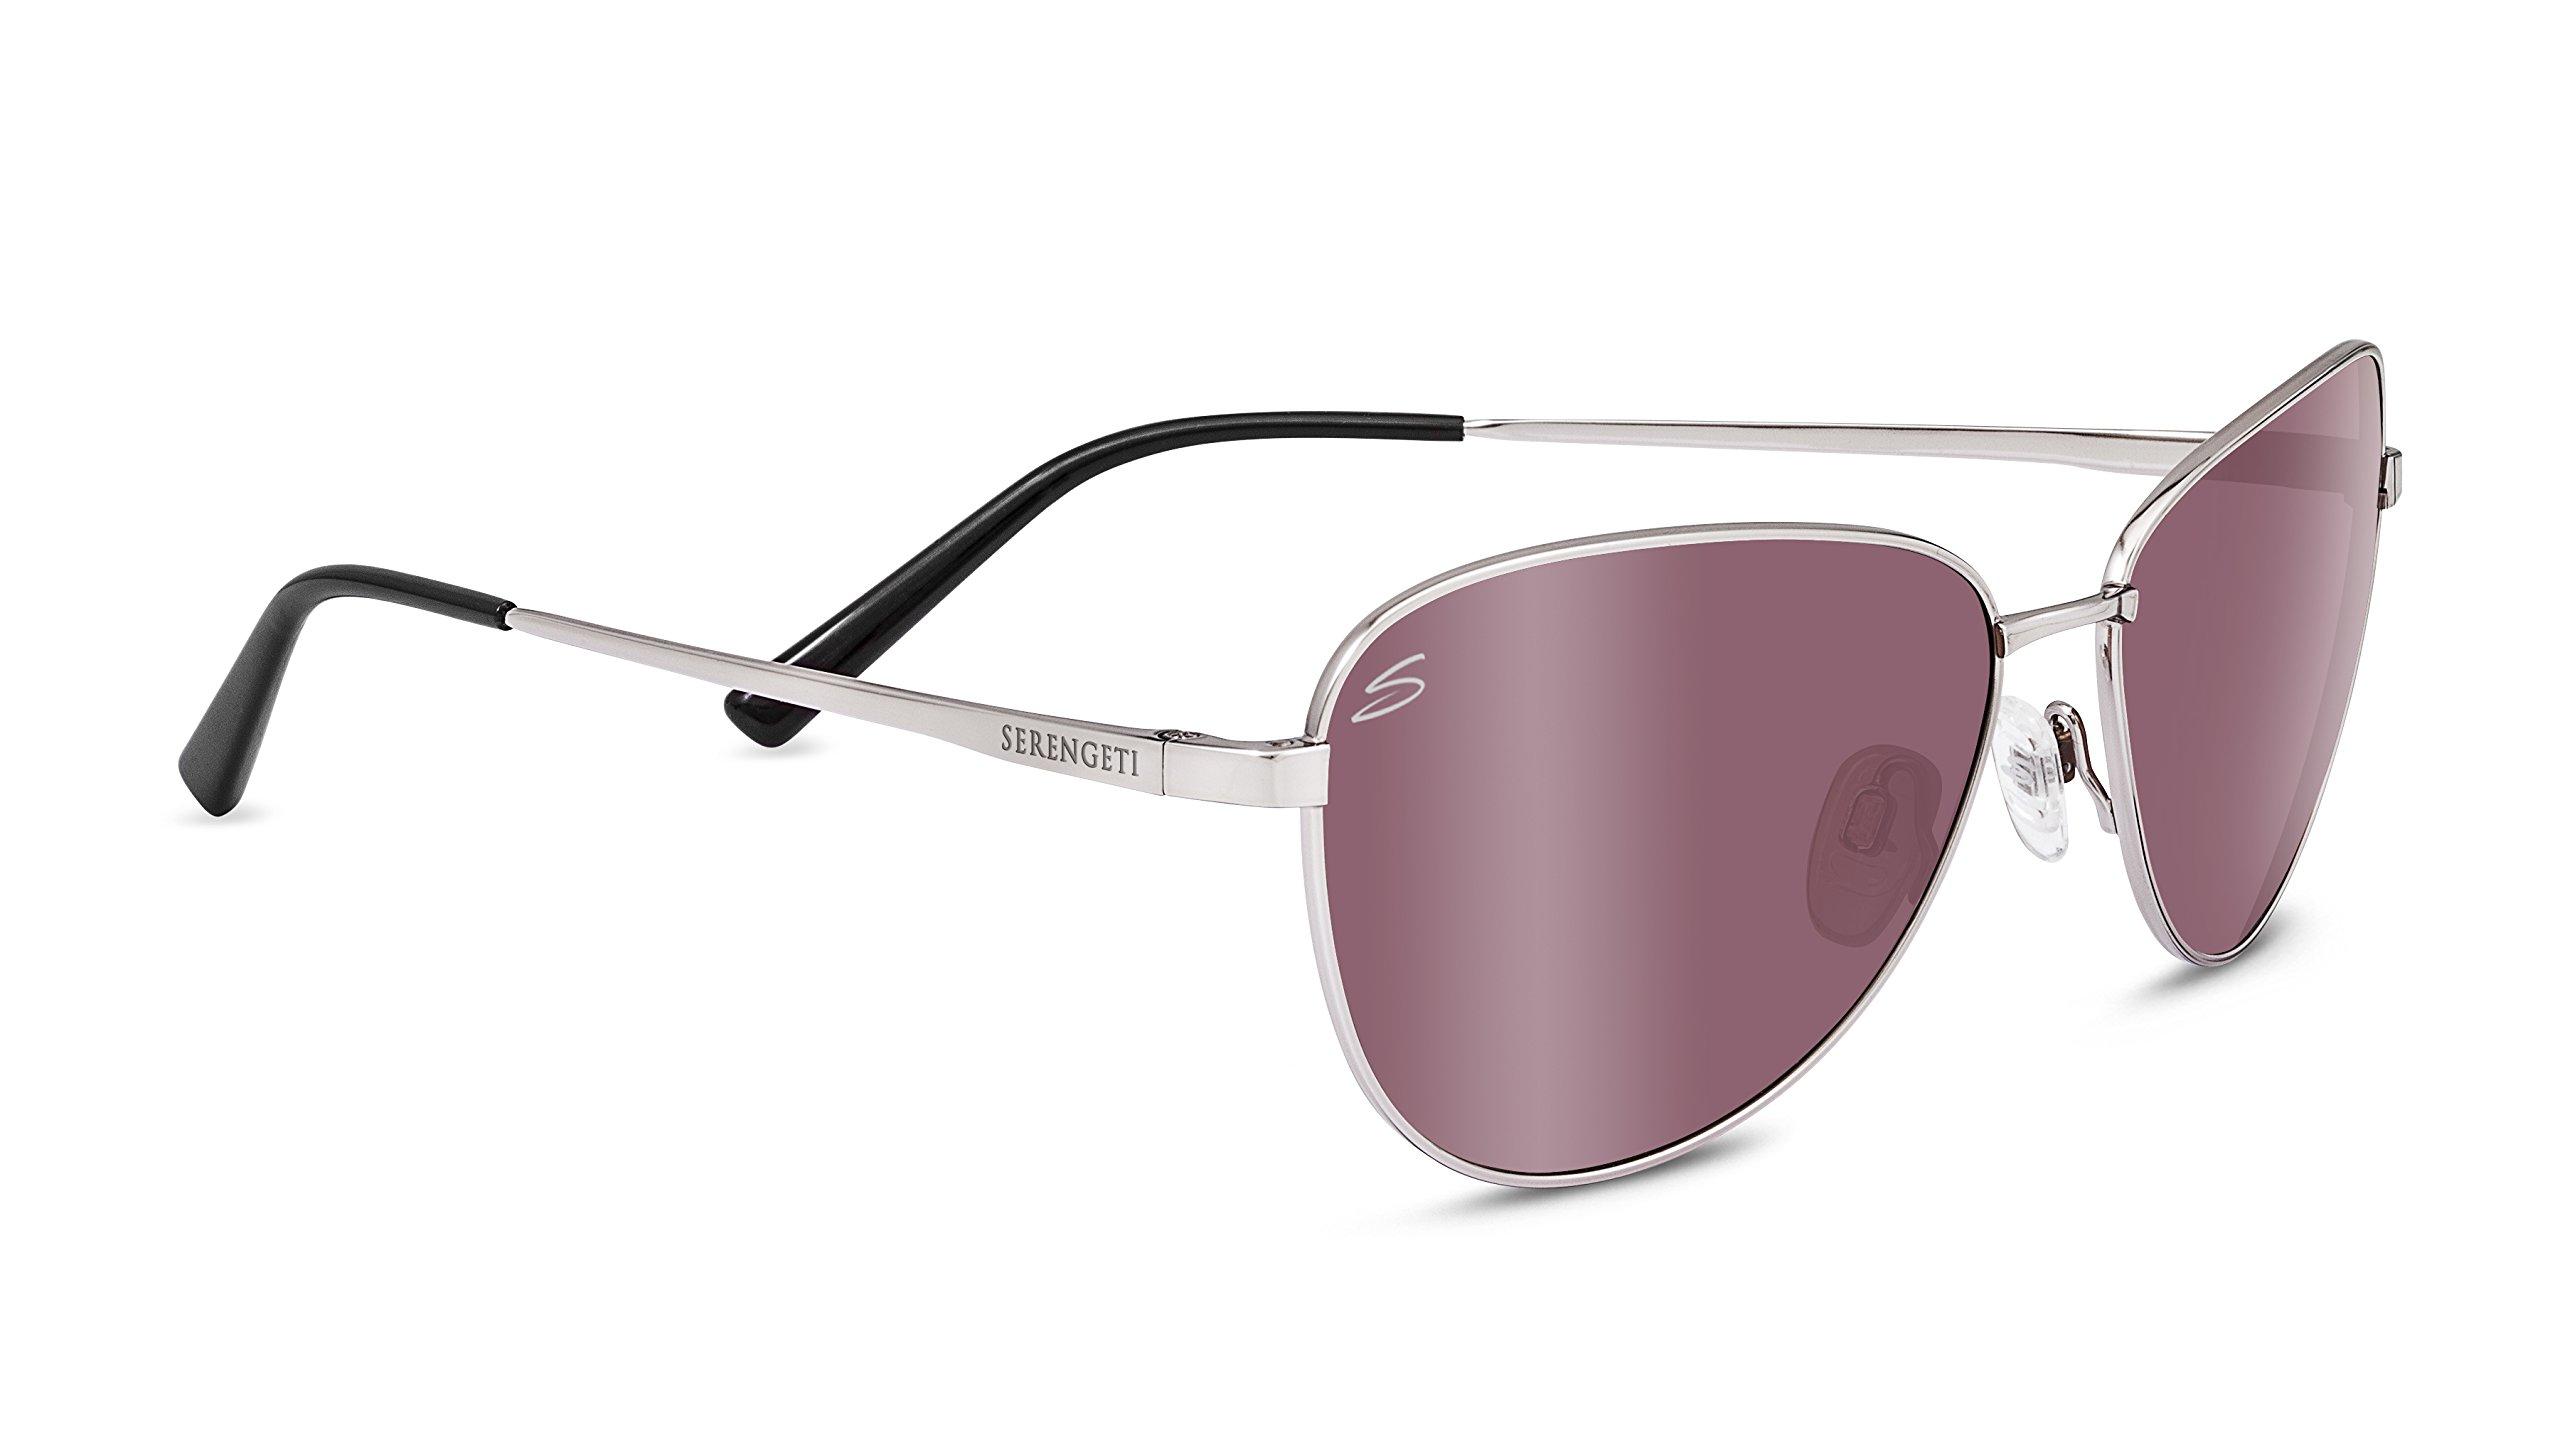 Serengeti 8413 Gloria Polarized Sedona Bi Mirror Sunglasses, Satin Titanium by Serengeti (Image #1)